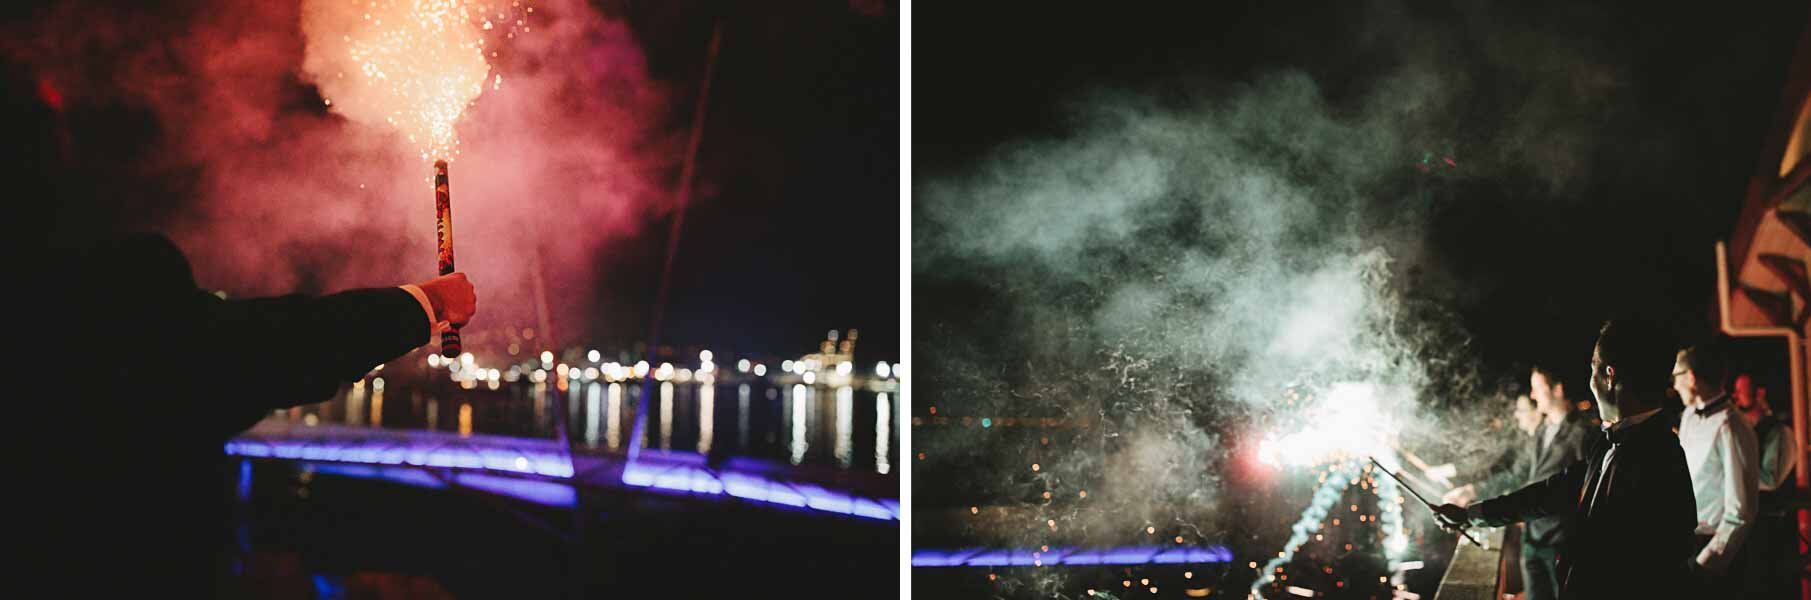 The Boatshed wedding fireworks.jpg